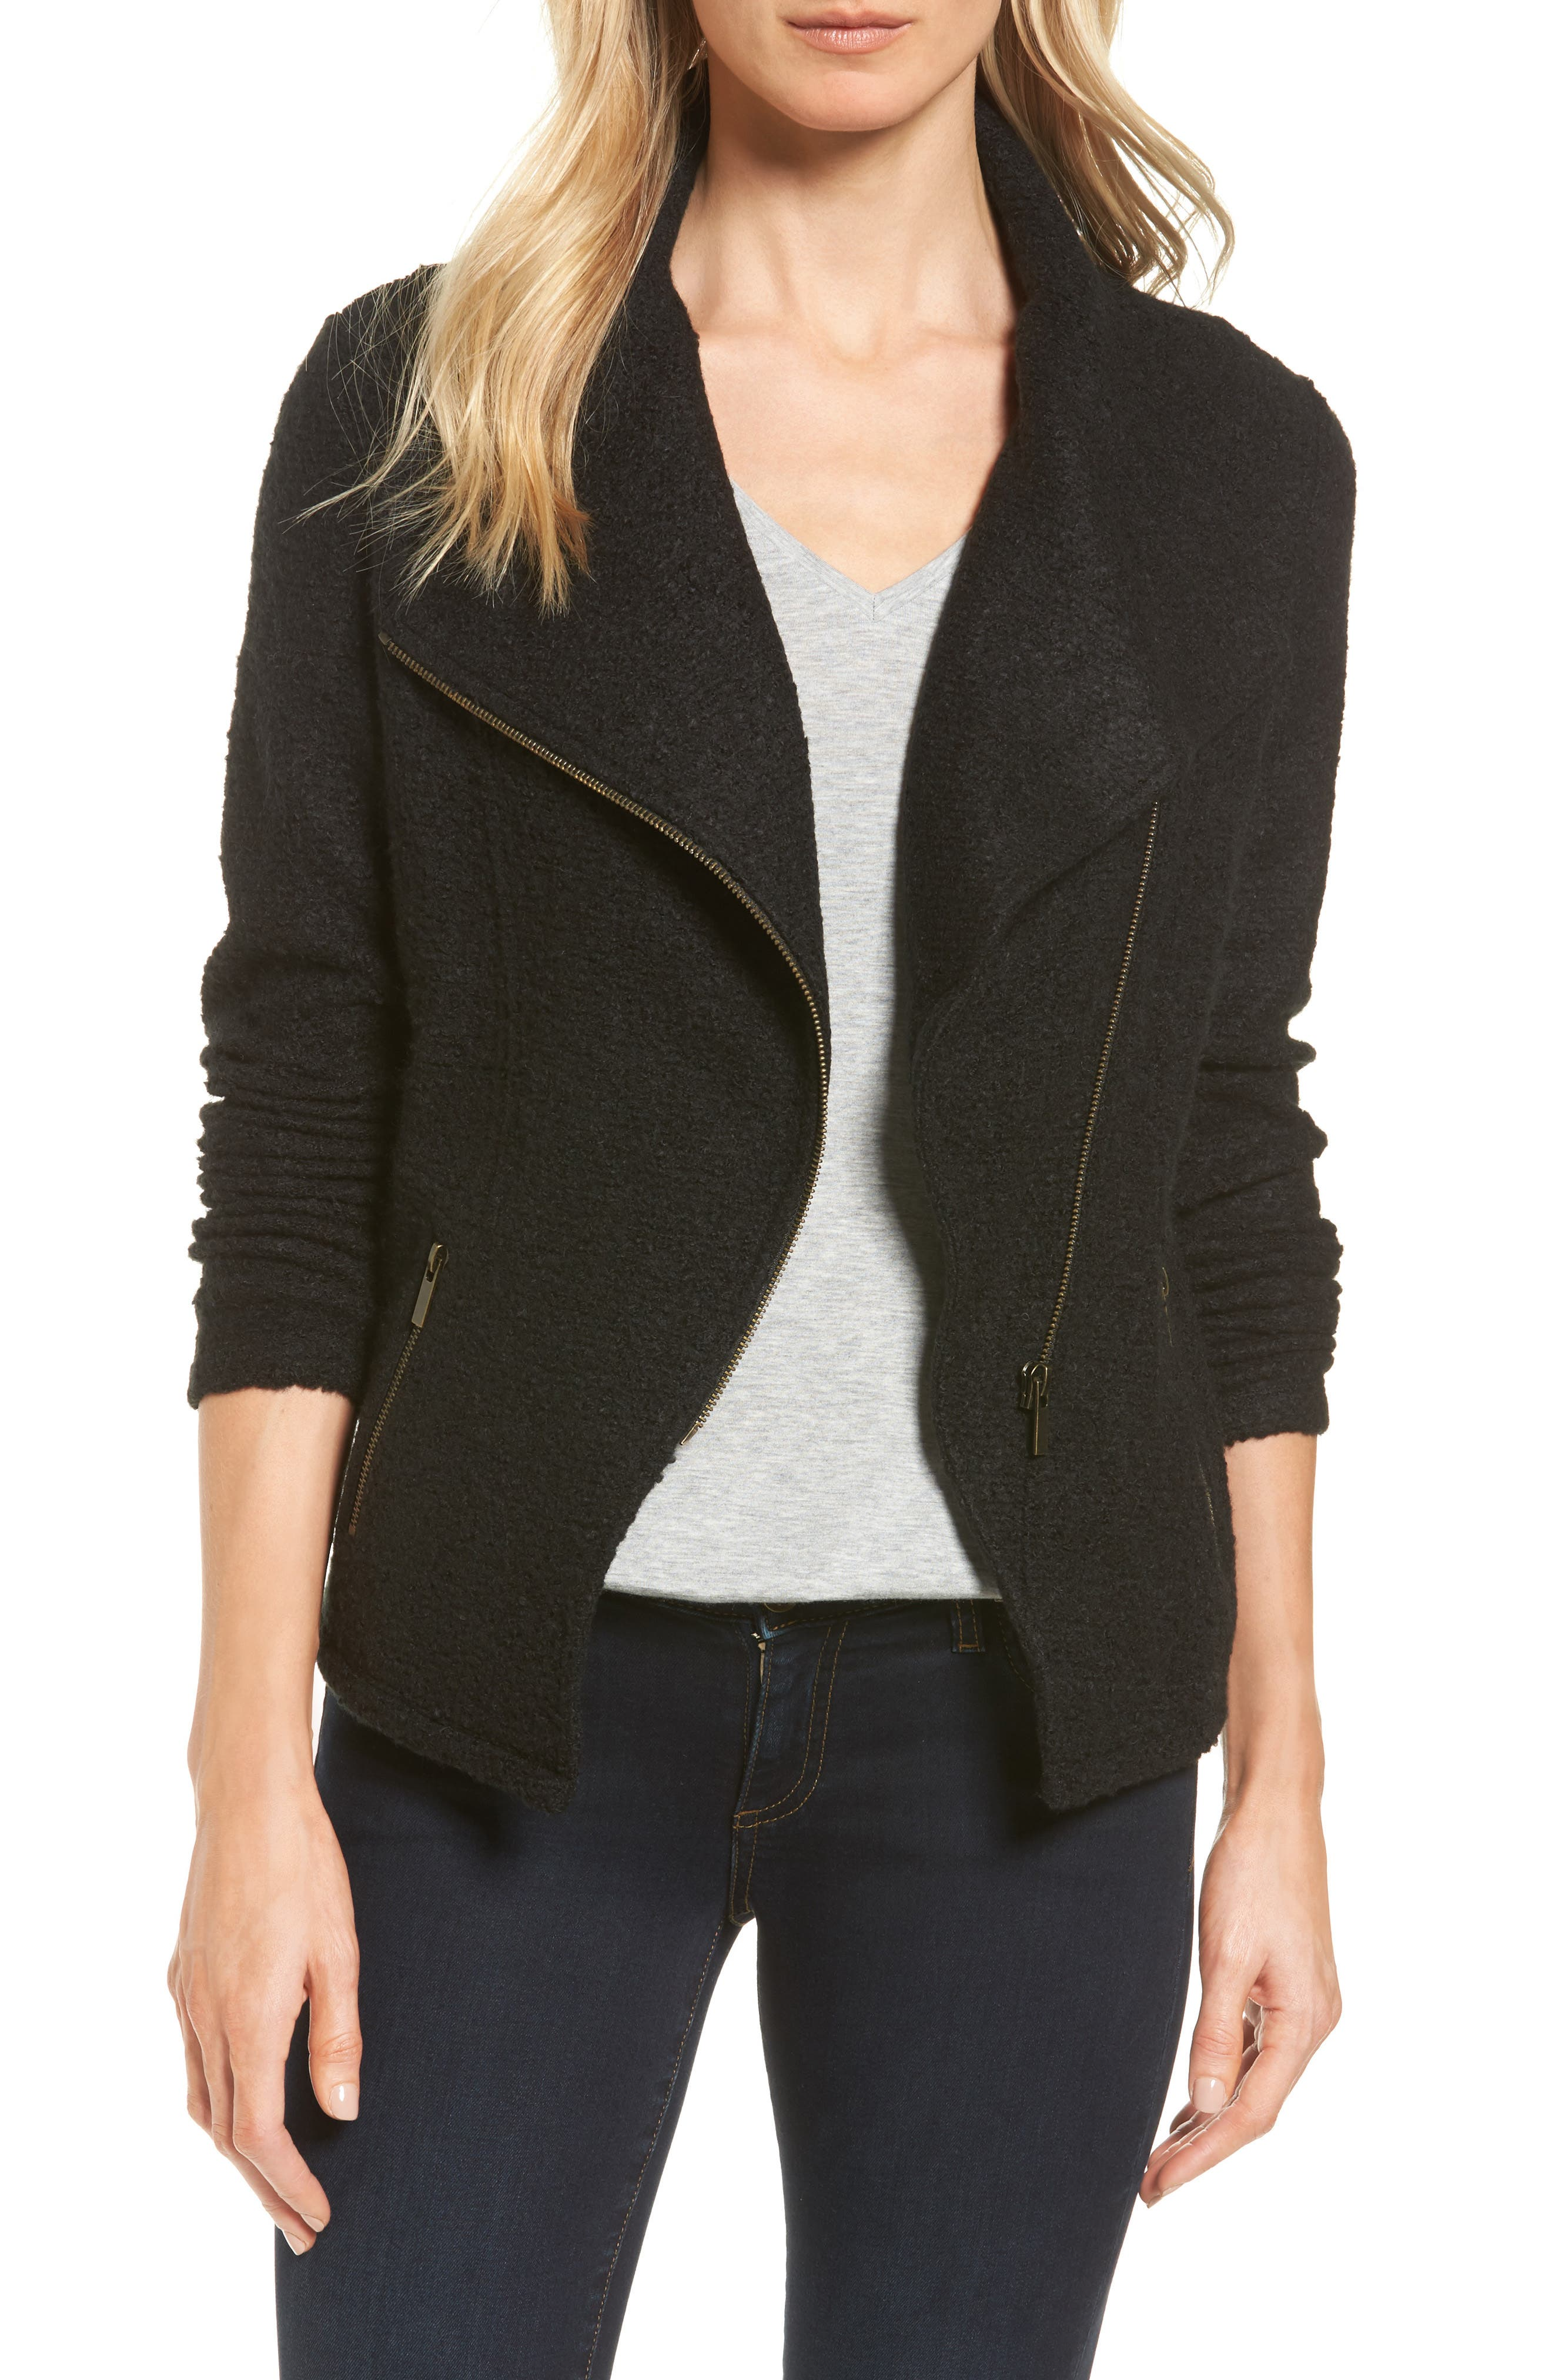 Alternate Image 1 Selected - Halogen® Knit Moto Jacket (Regular & Petite)